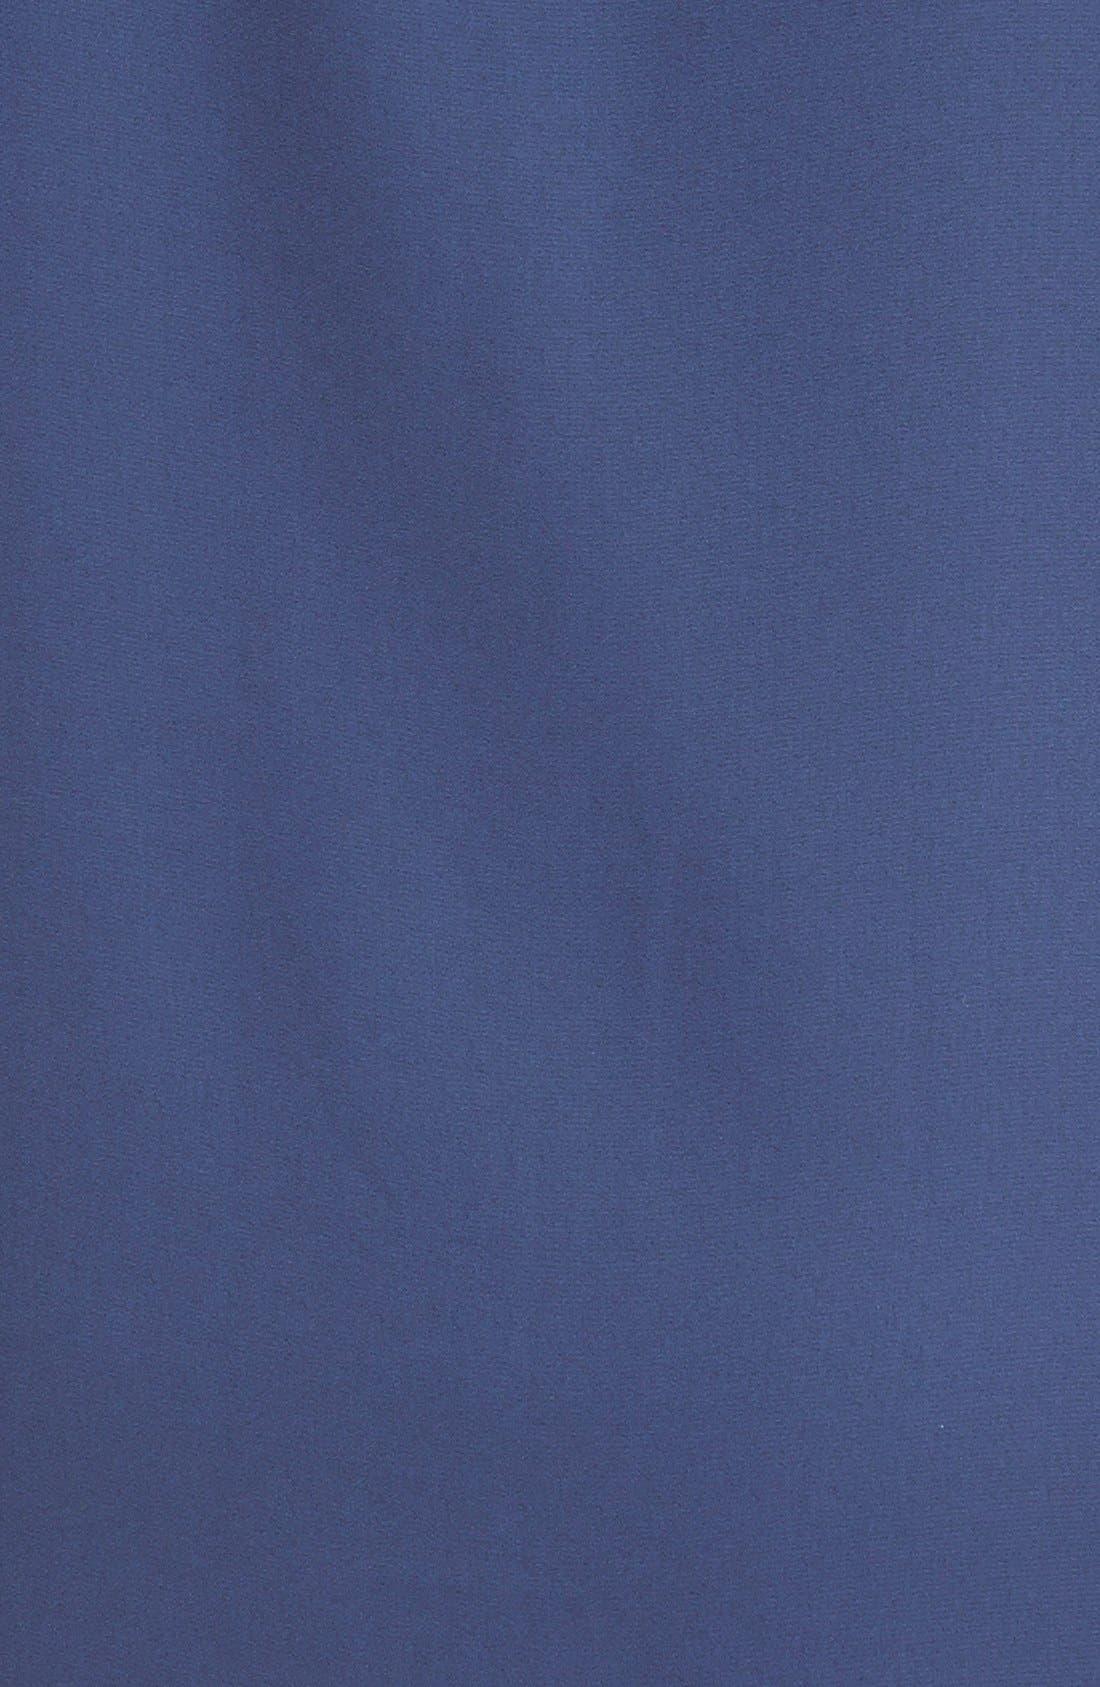 Alternate Image 3  - Everly Roll Tab Sleeve Shift Dress (Juniors)